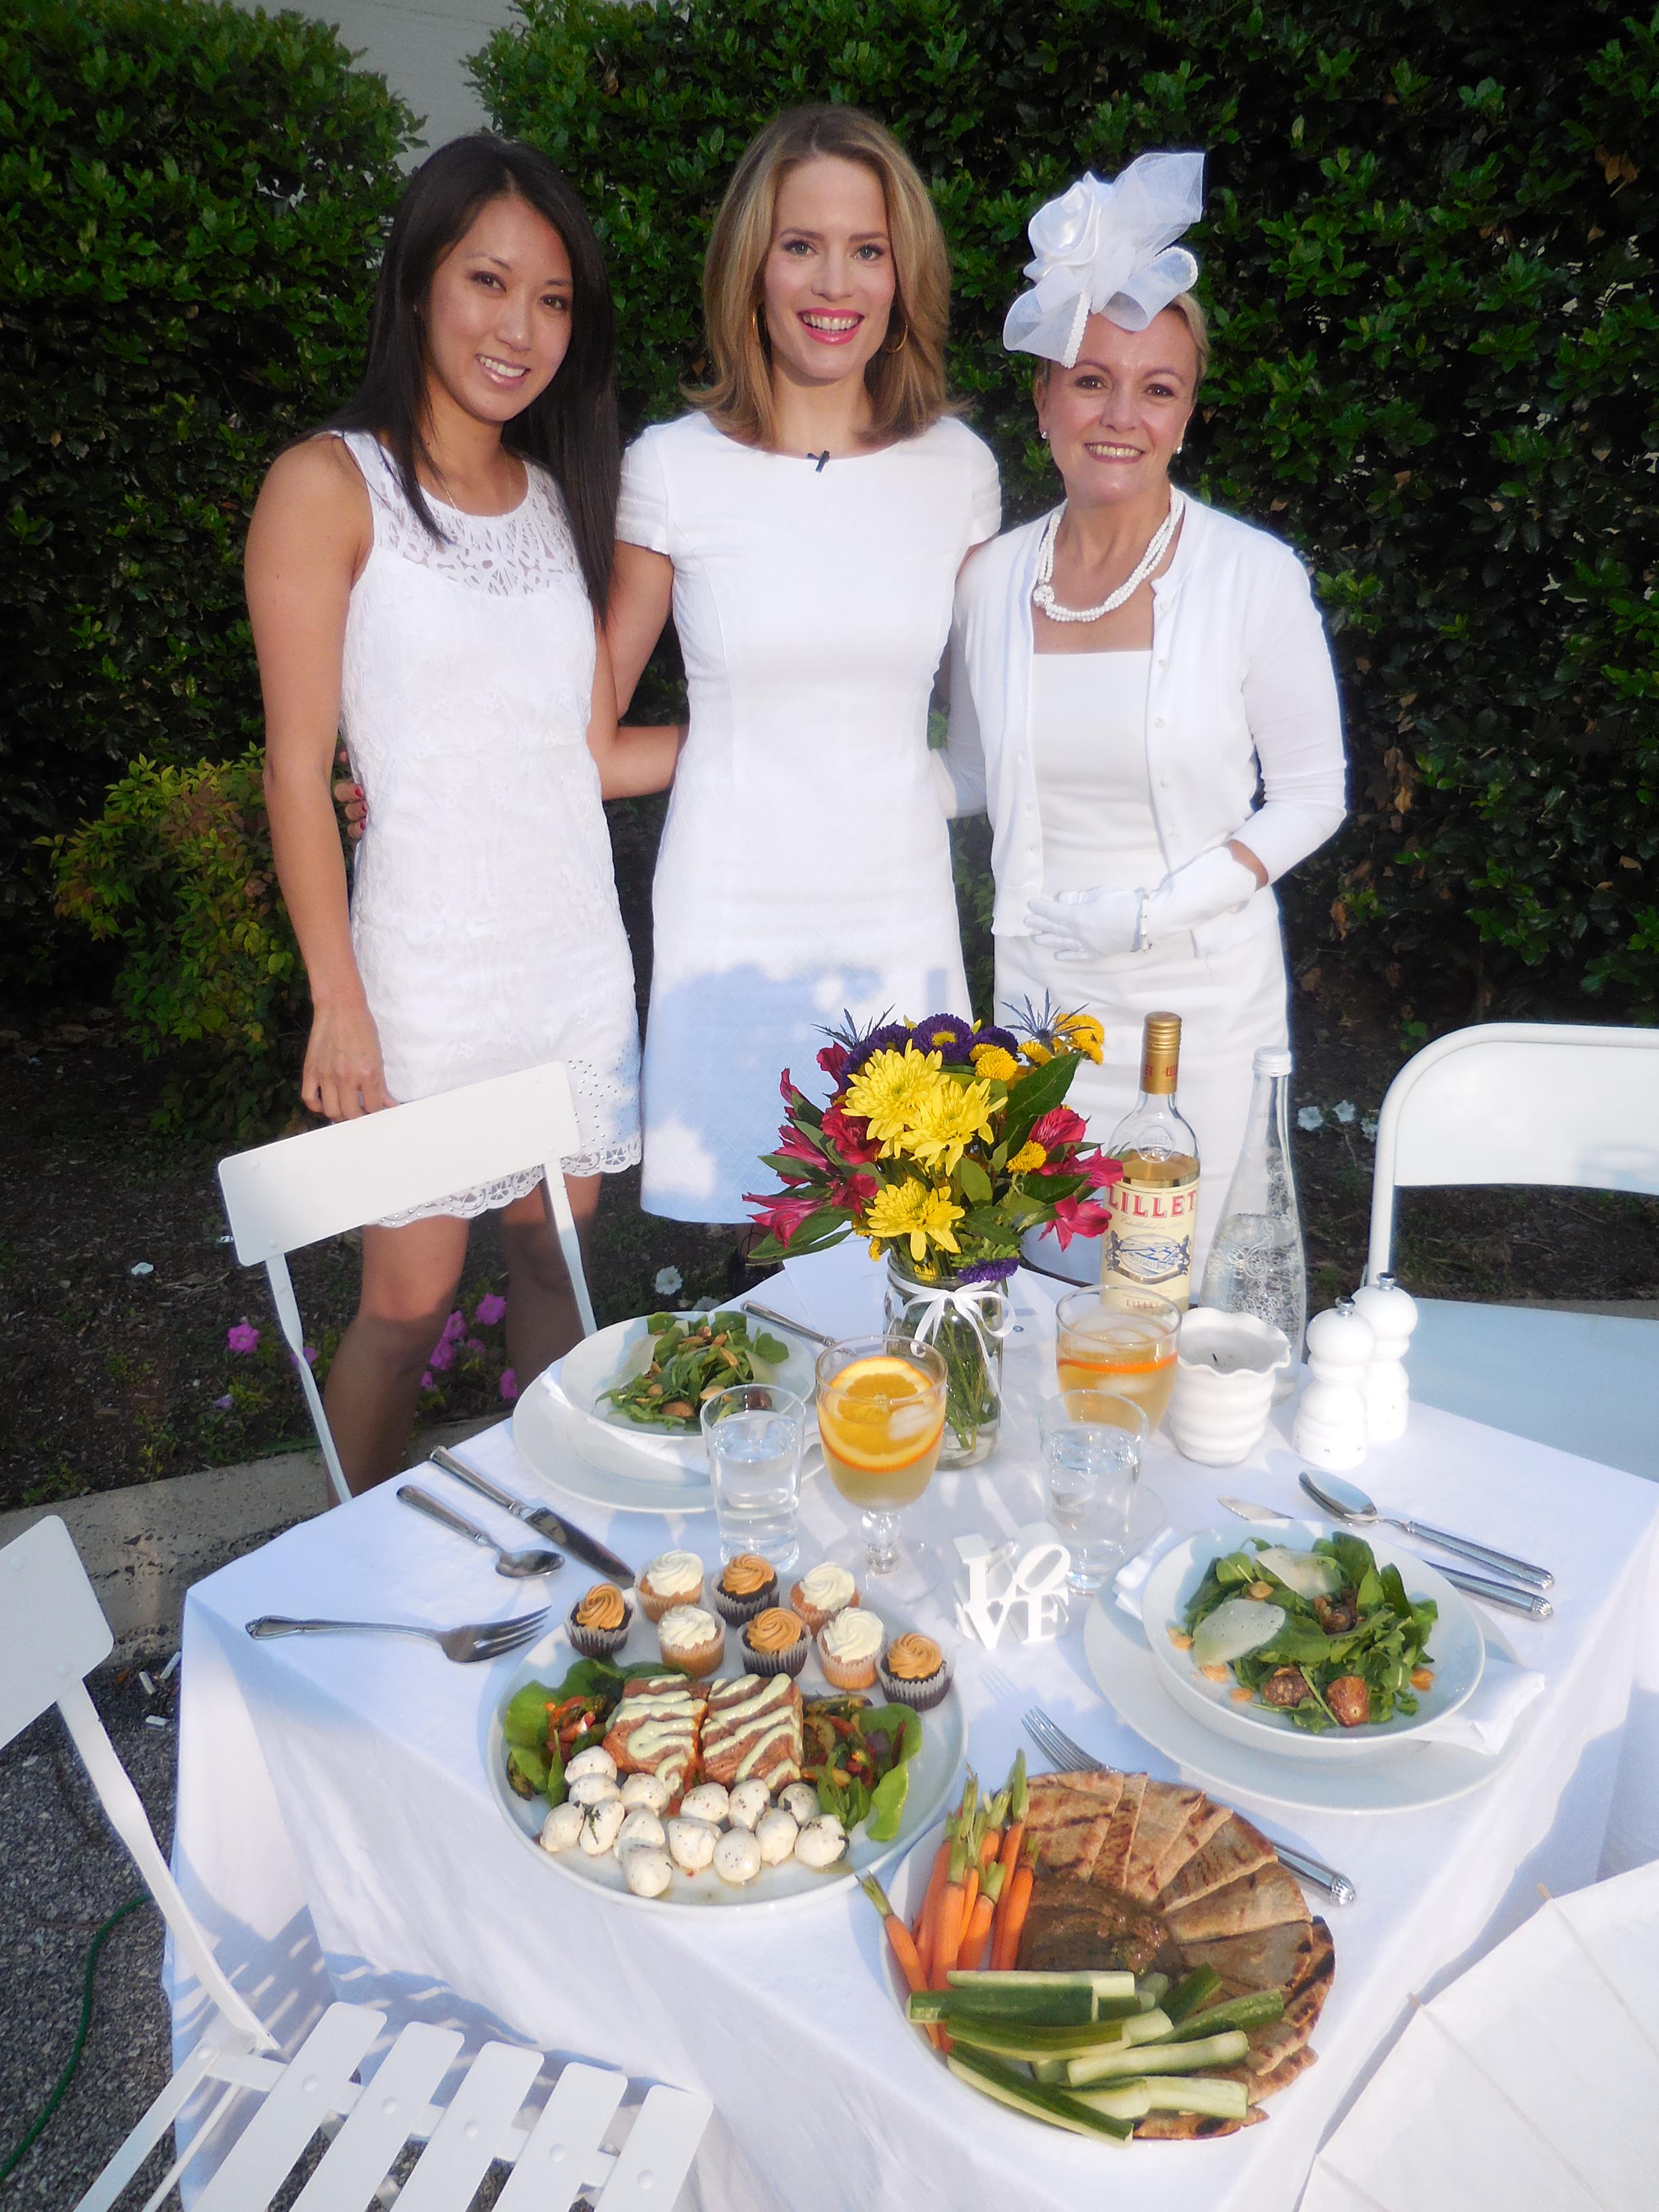 Diner en Blanc, Diner en Blanc Philadelphia, Debphl, Debphl14, CBS, CBS Philly, PR, Media Shoot, TV shoot